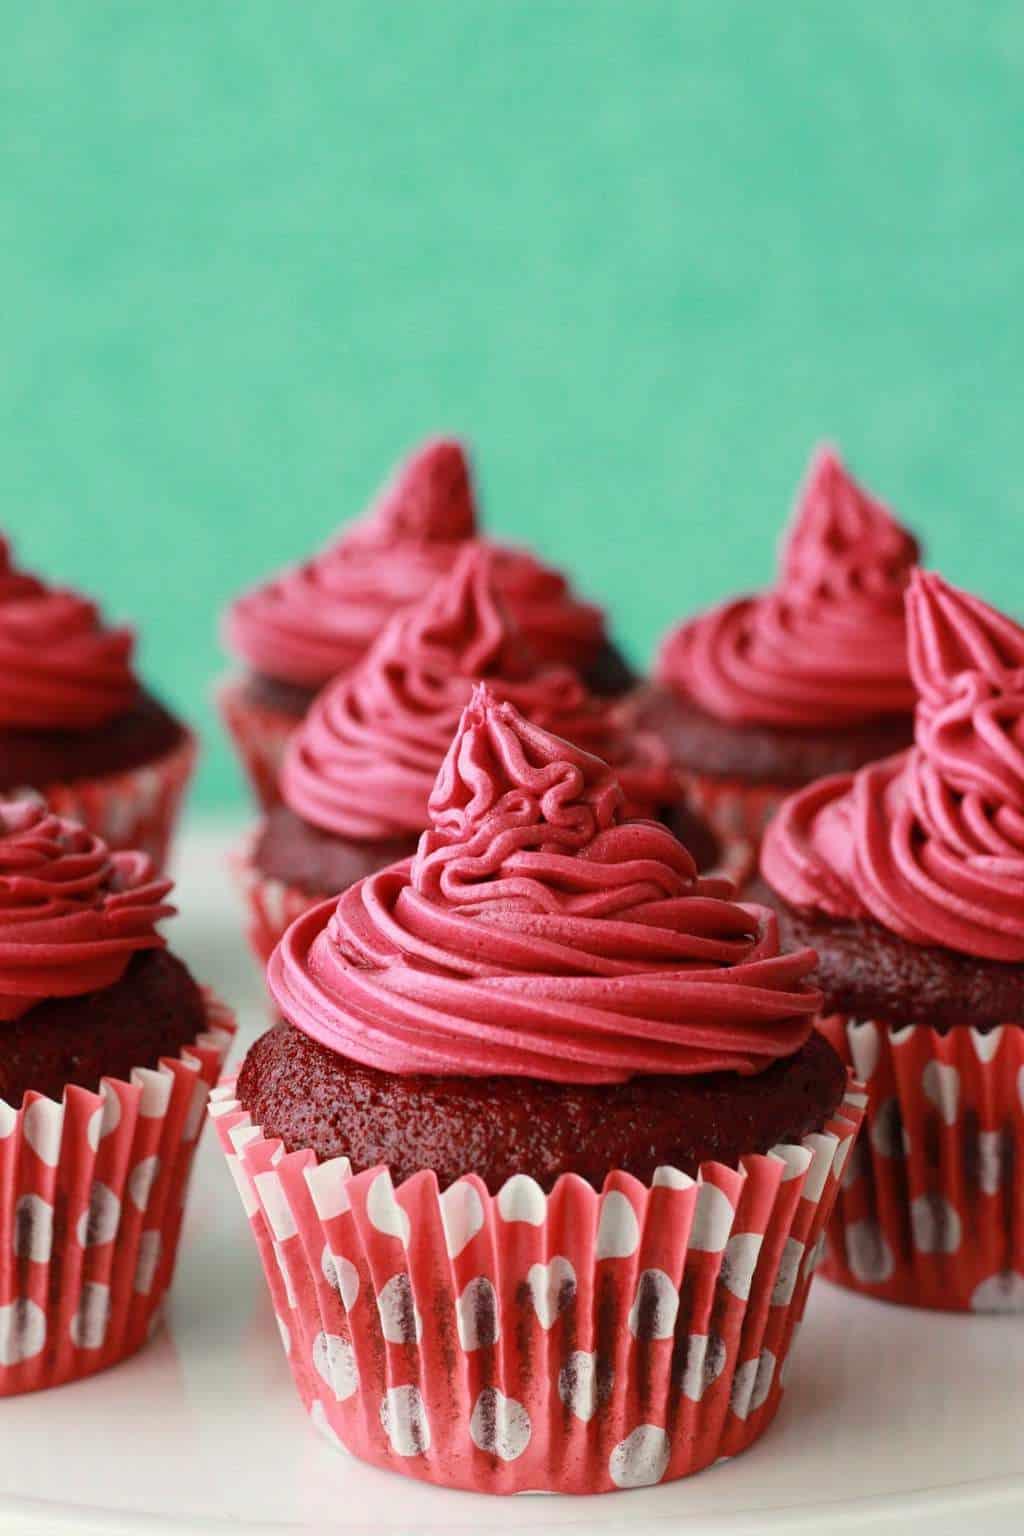 Vegan Red Velvet Cupcakes - blogs de Recipes